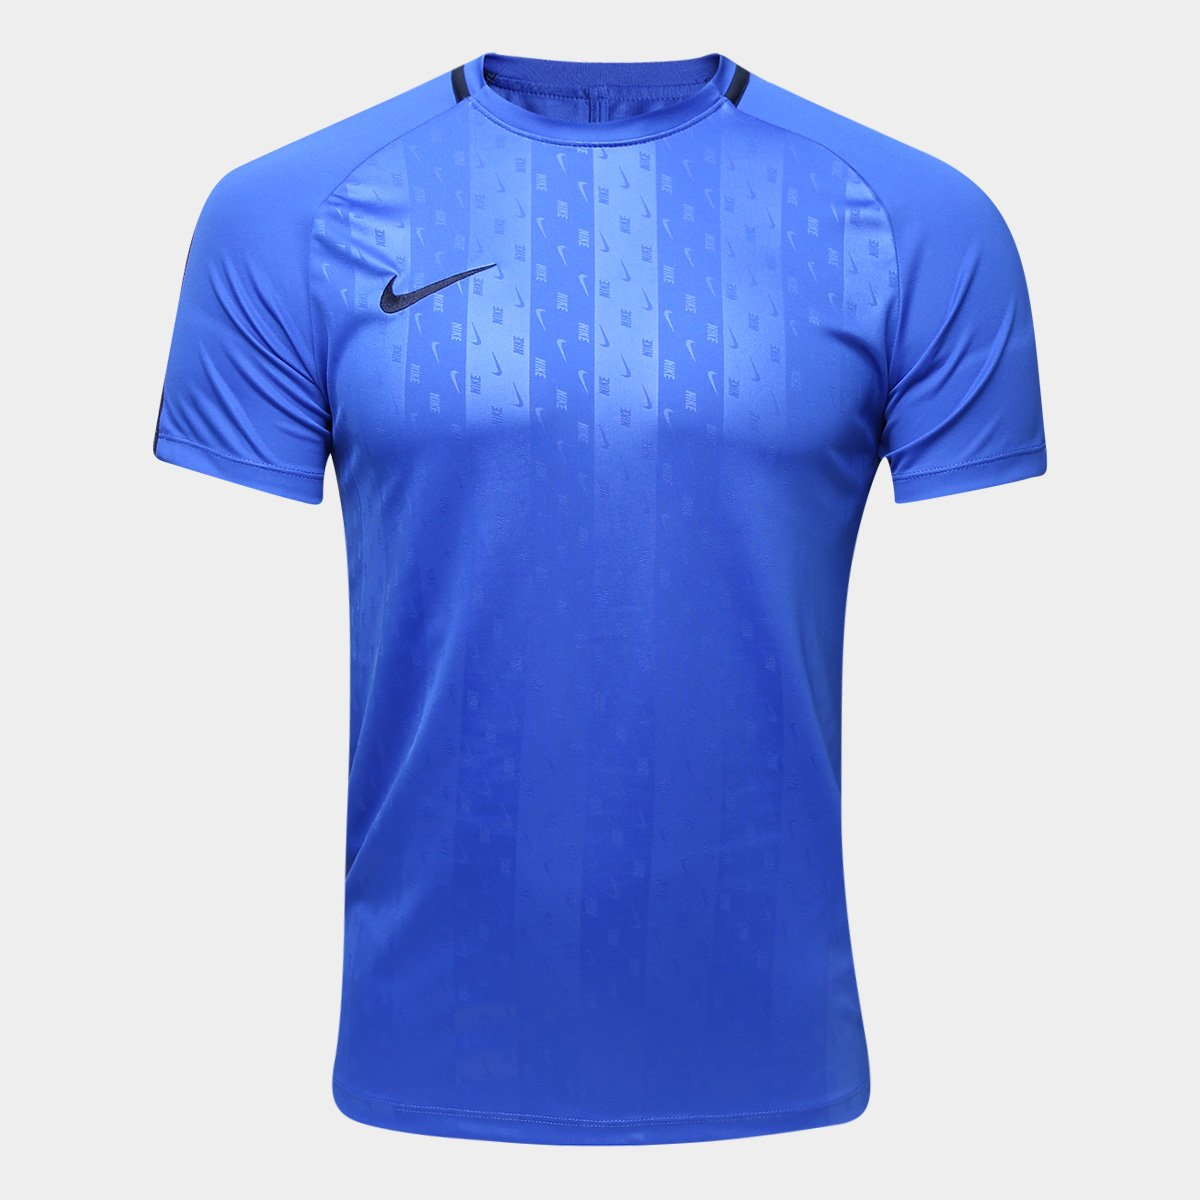 a9315a8e6f Camisa Nike Dry Academy Top SS Masculina - Compre Agora